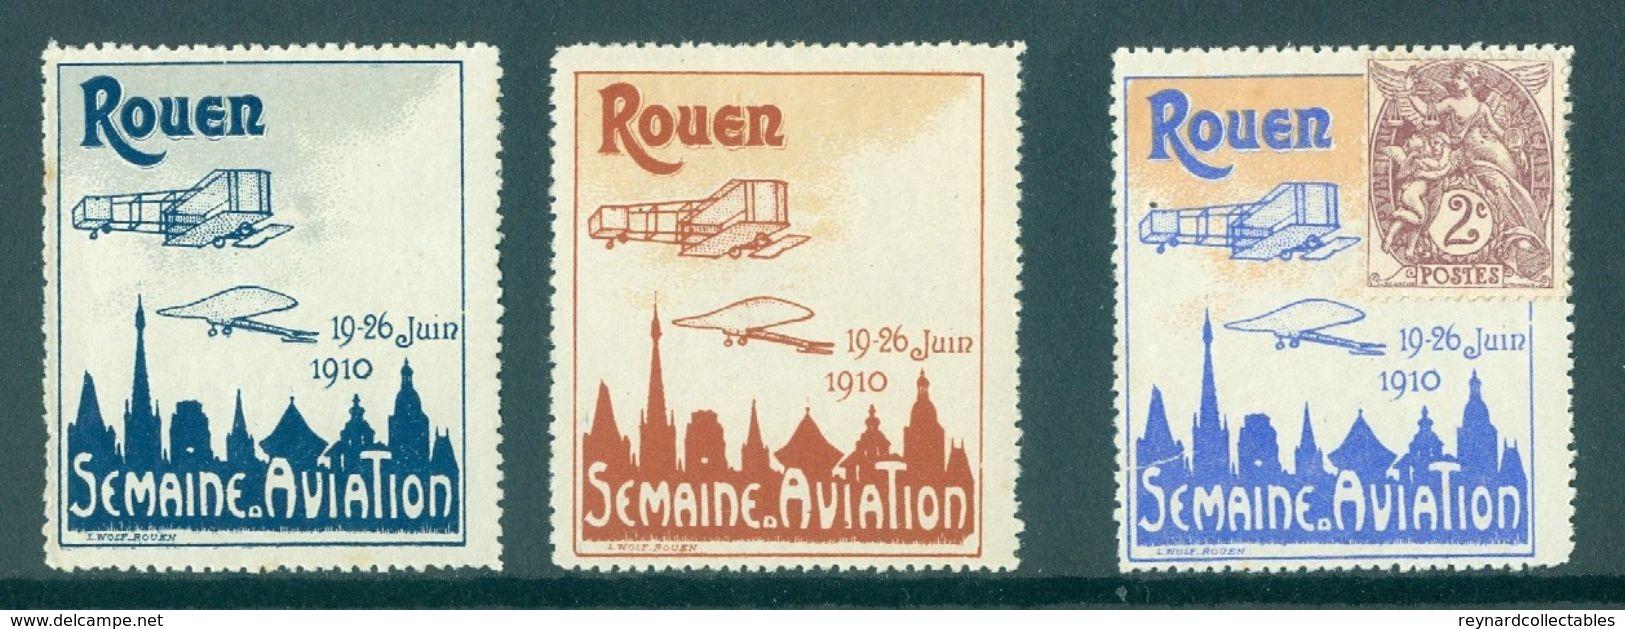 1910 France Rouen Grande Semaine D Aviation Illustrated Vignettes (3 Off) - Airmail